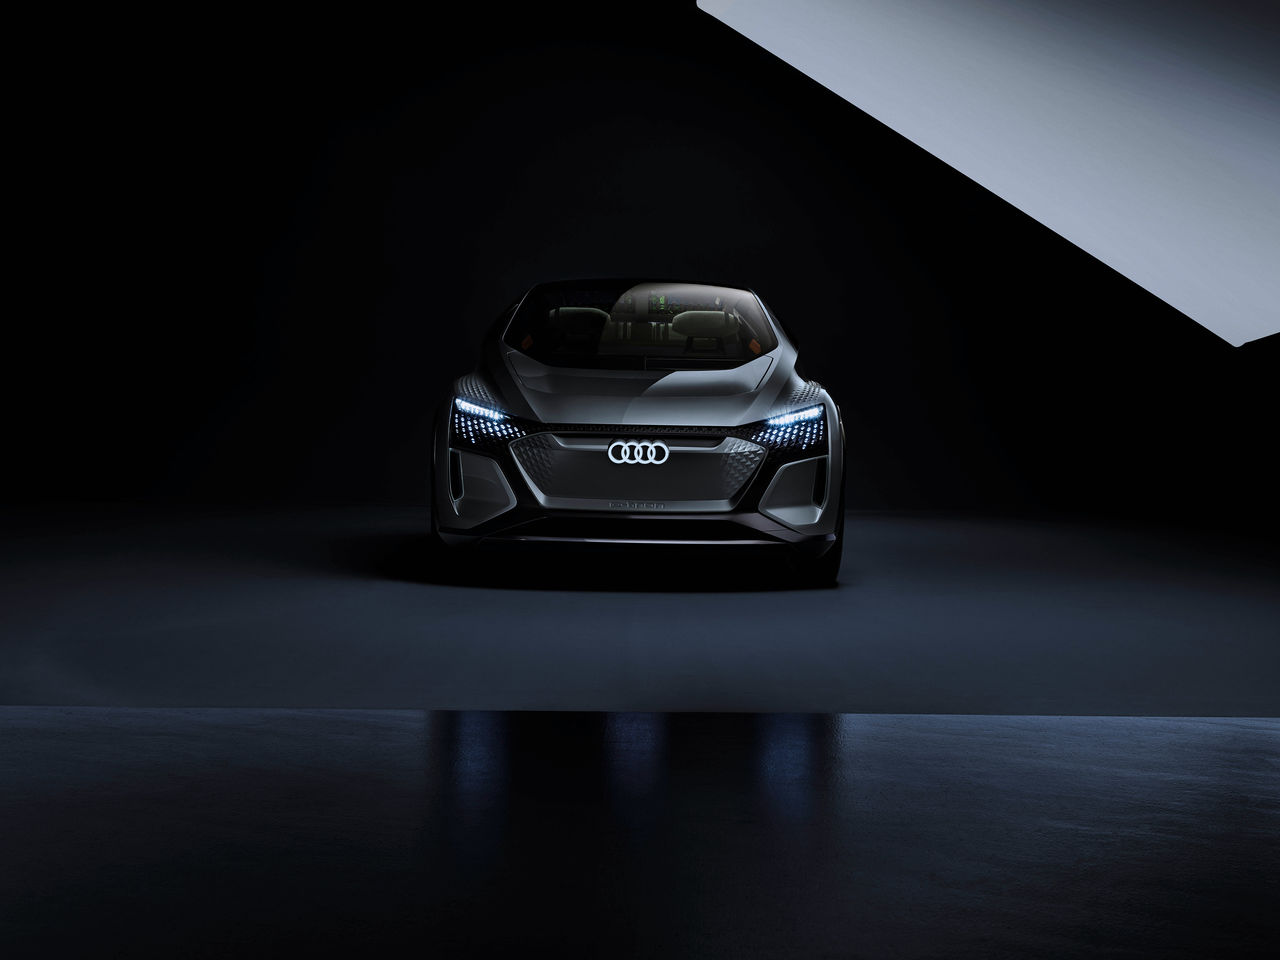 Mobility for Megacities: Audi AI:ME – Automotivetestdrivers